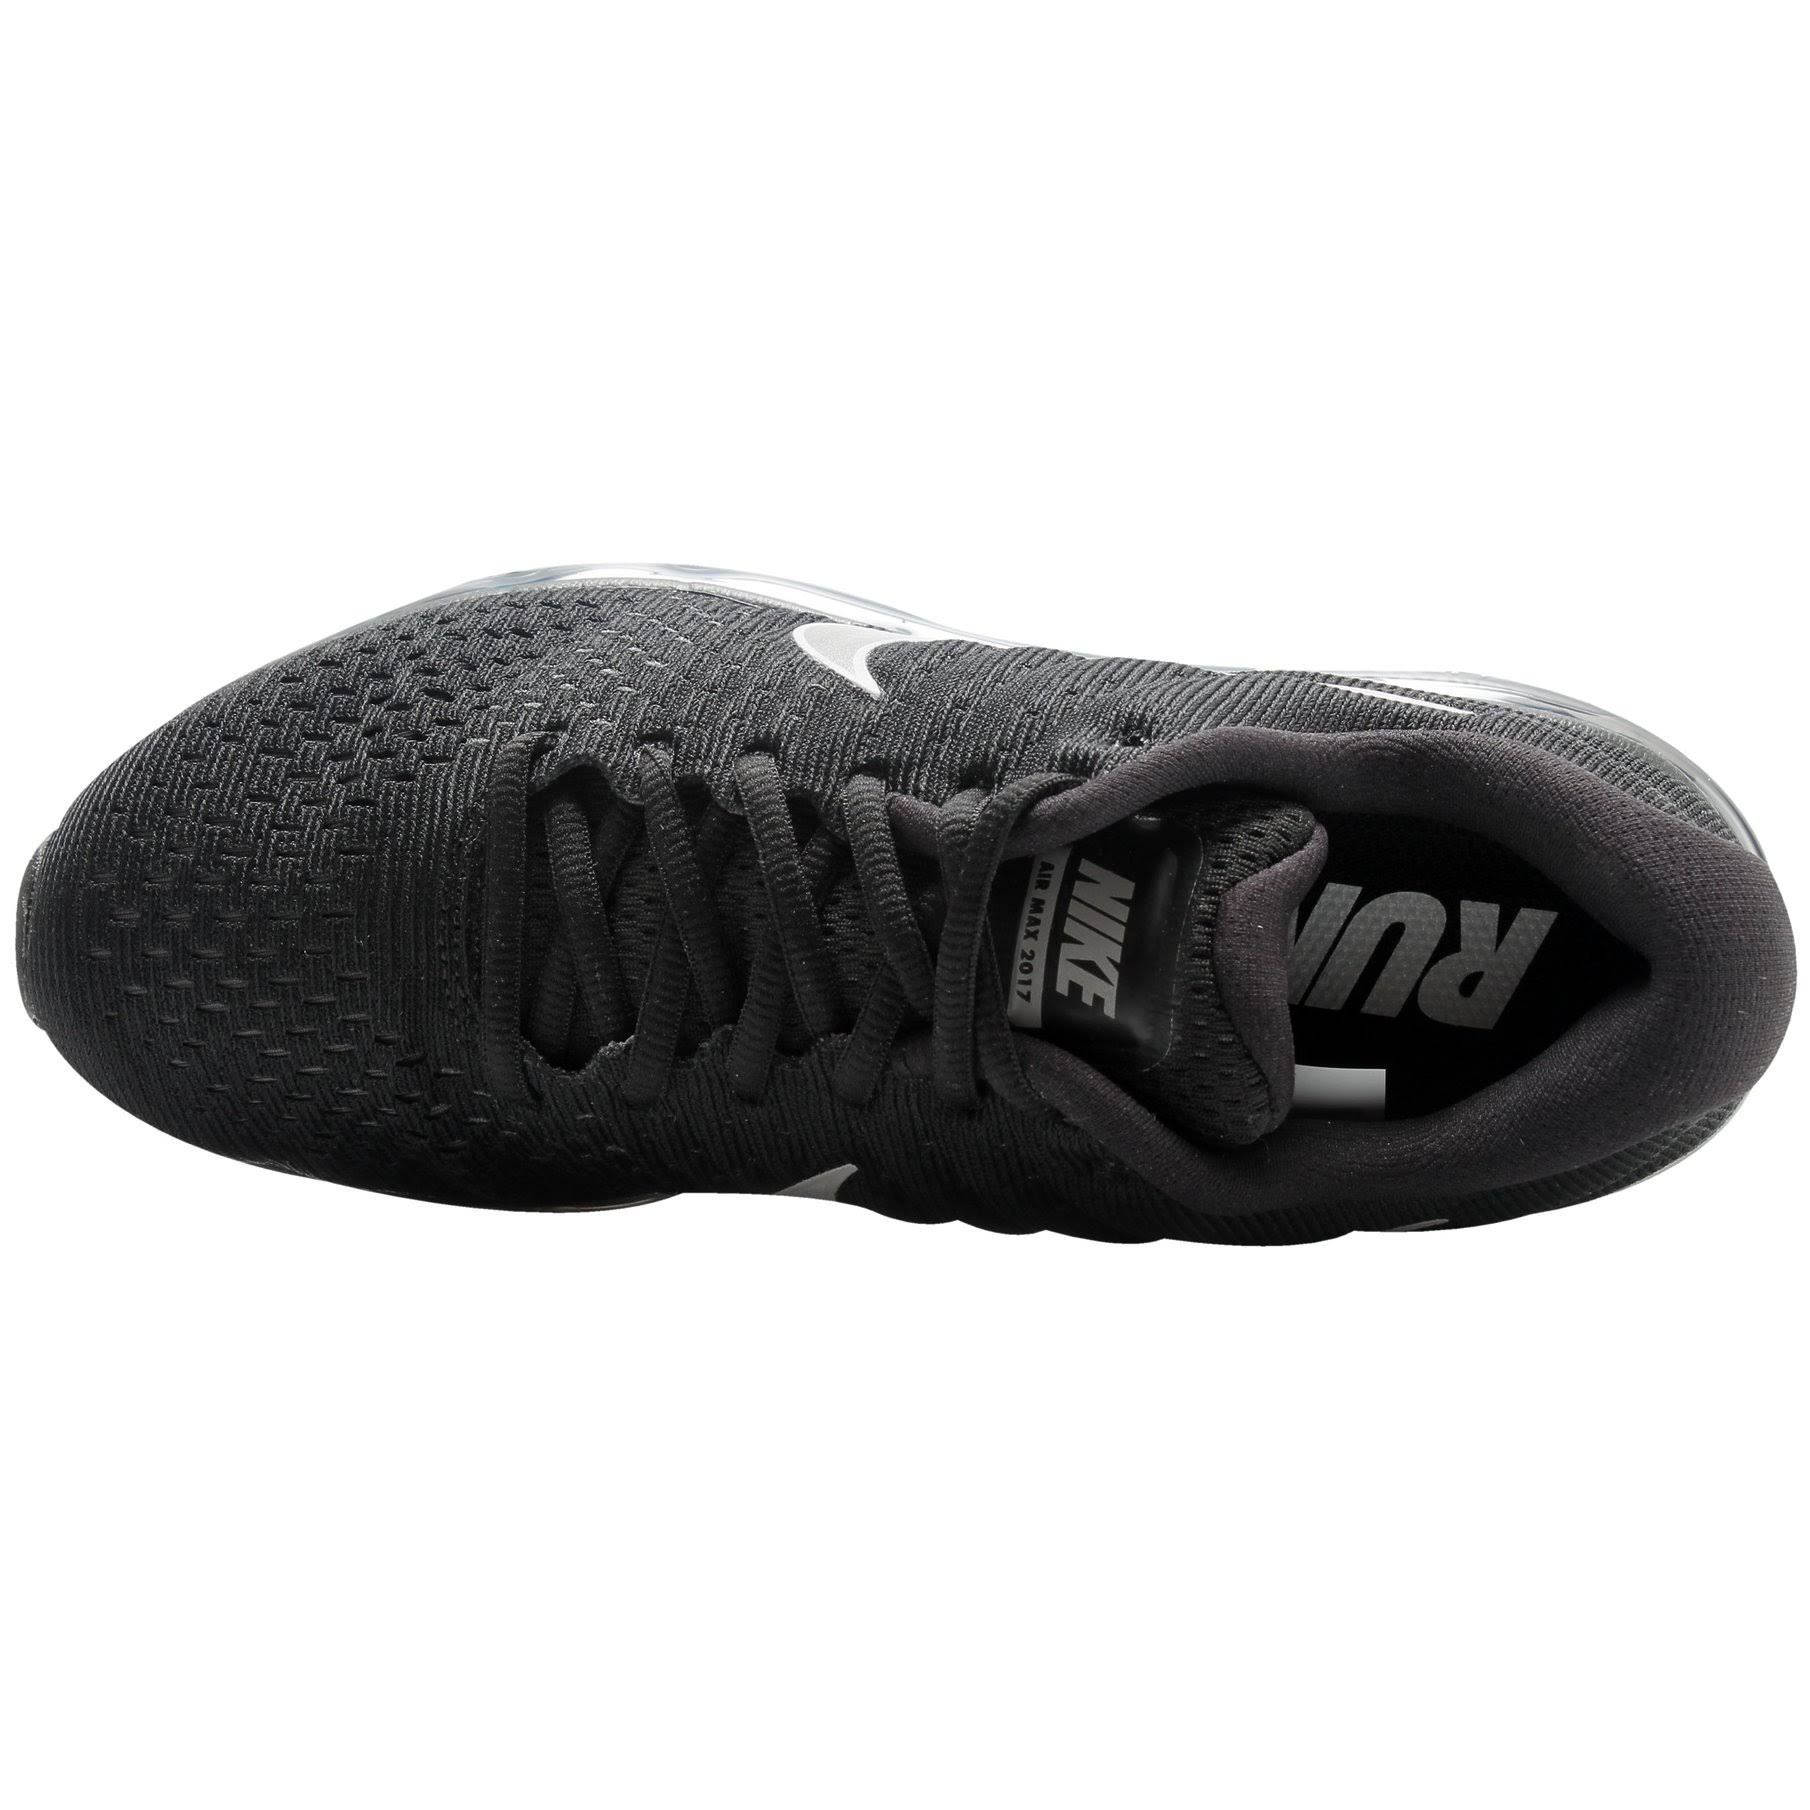 2017 Damen Air Laufschuhe 5 8 Nike Größe 849560001 Max BRwqZz